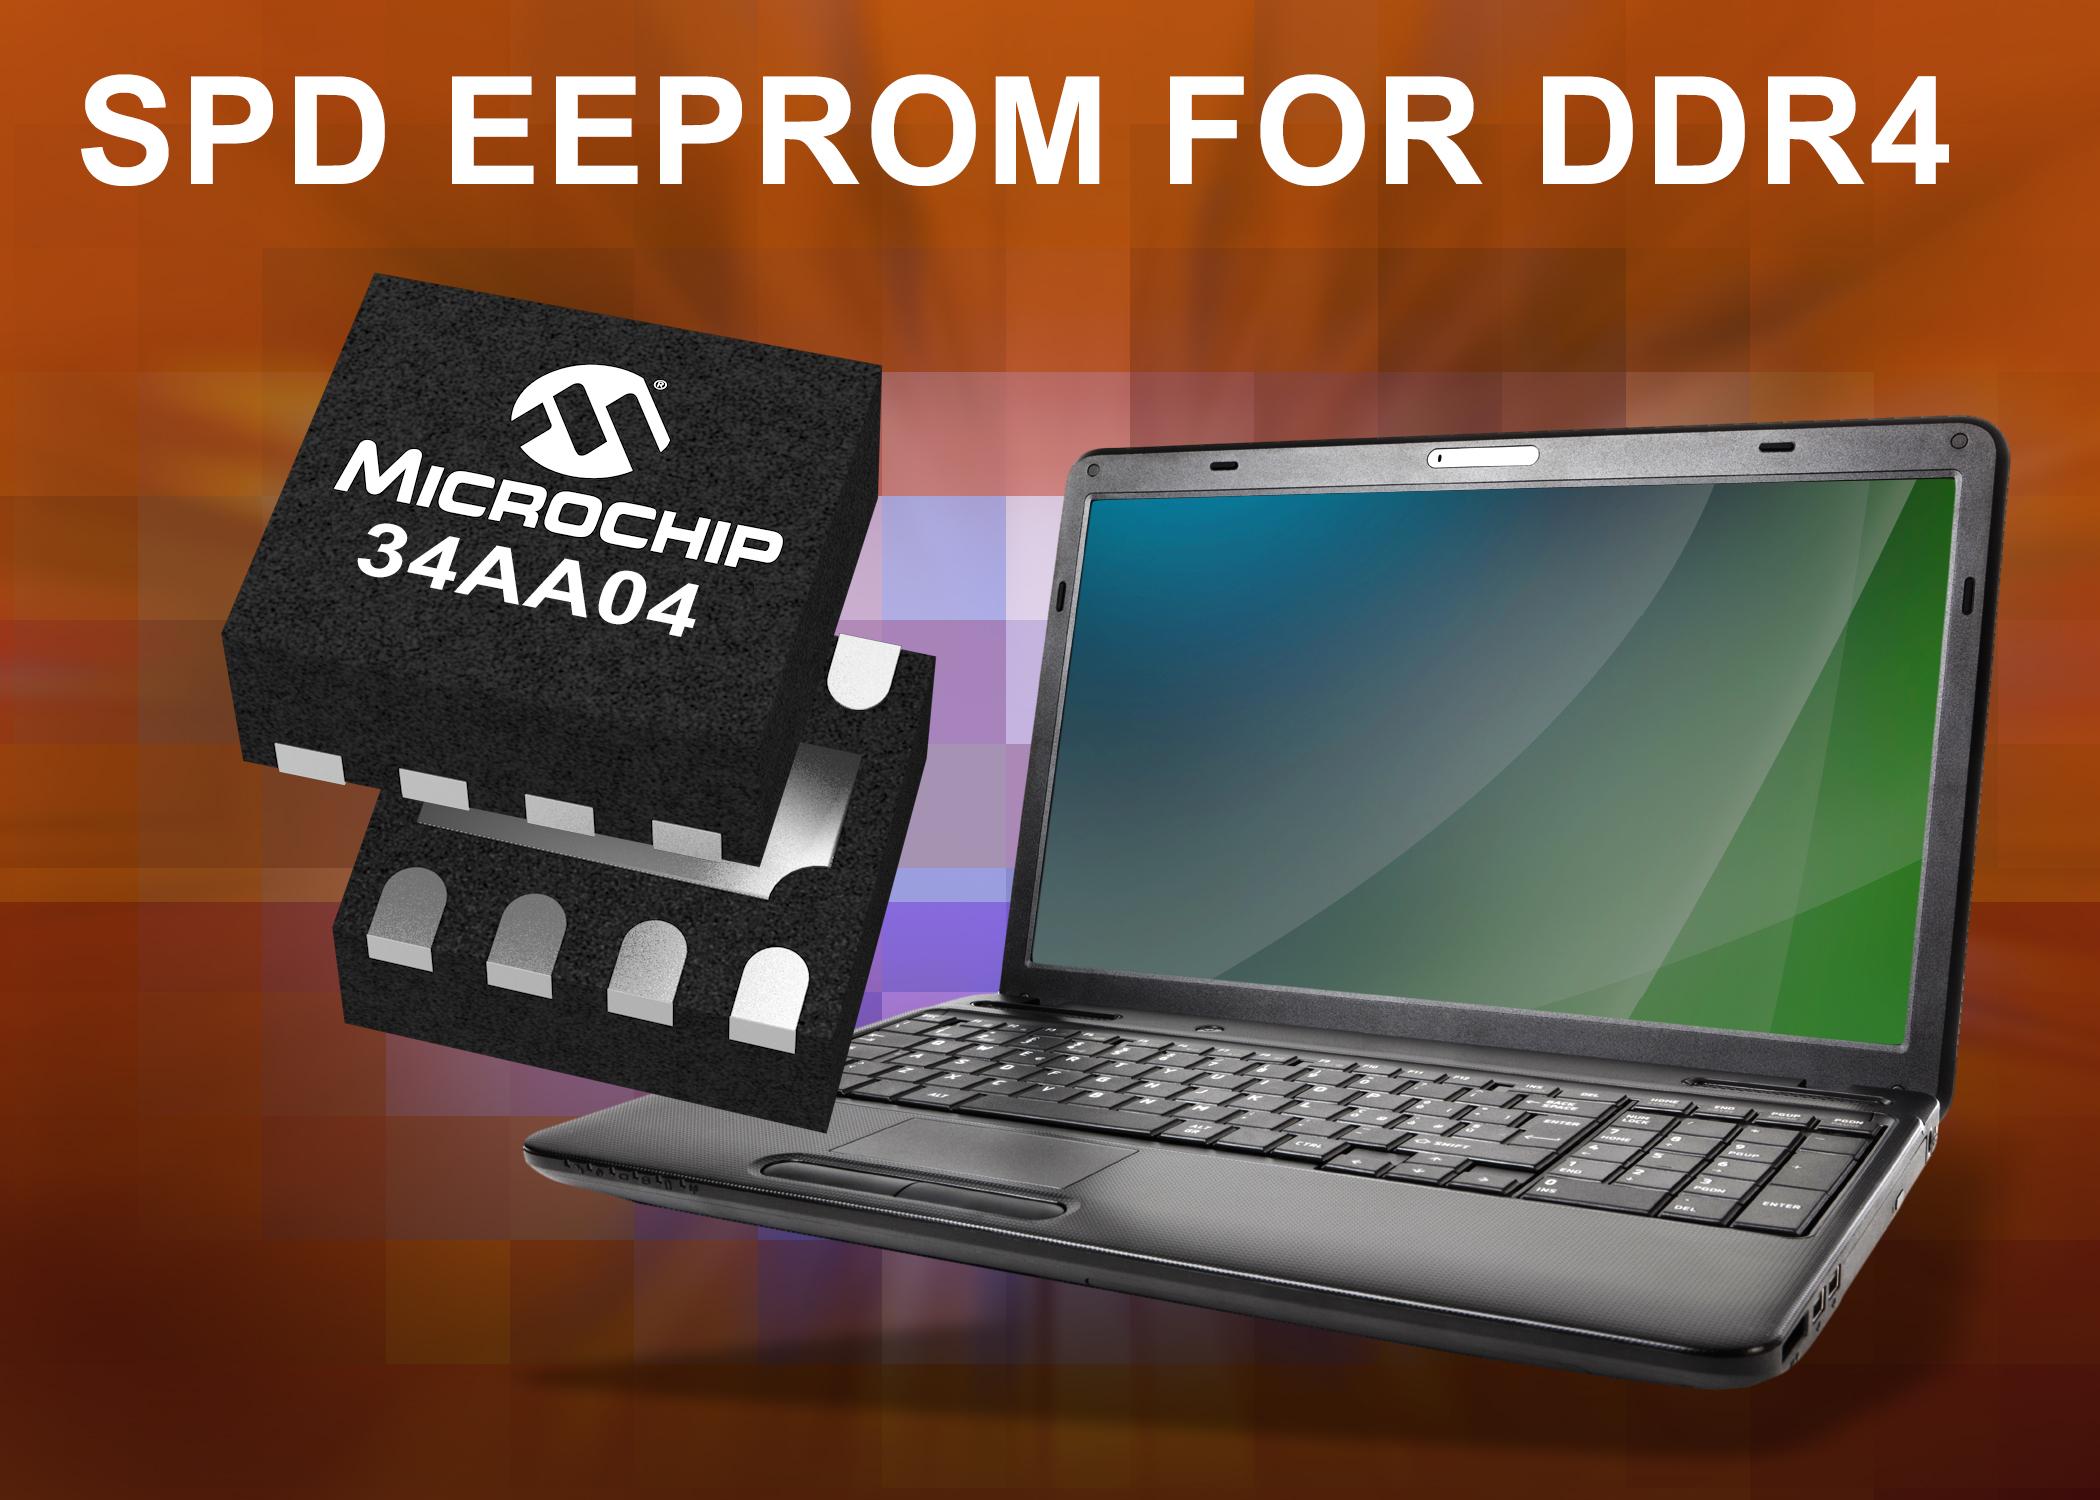 Microchip推出用于DDR4 SDRAM??榈? Kb串行存在检测EEPROM器件